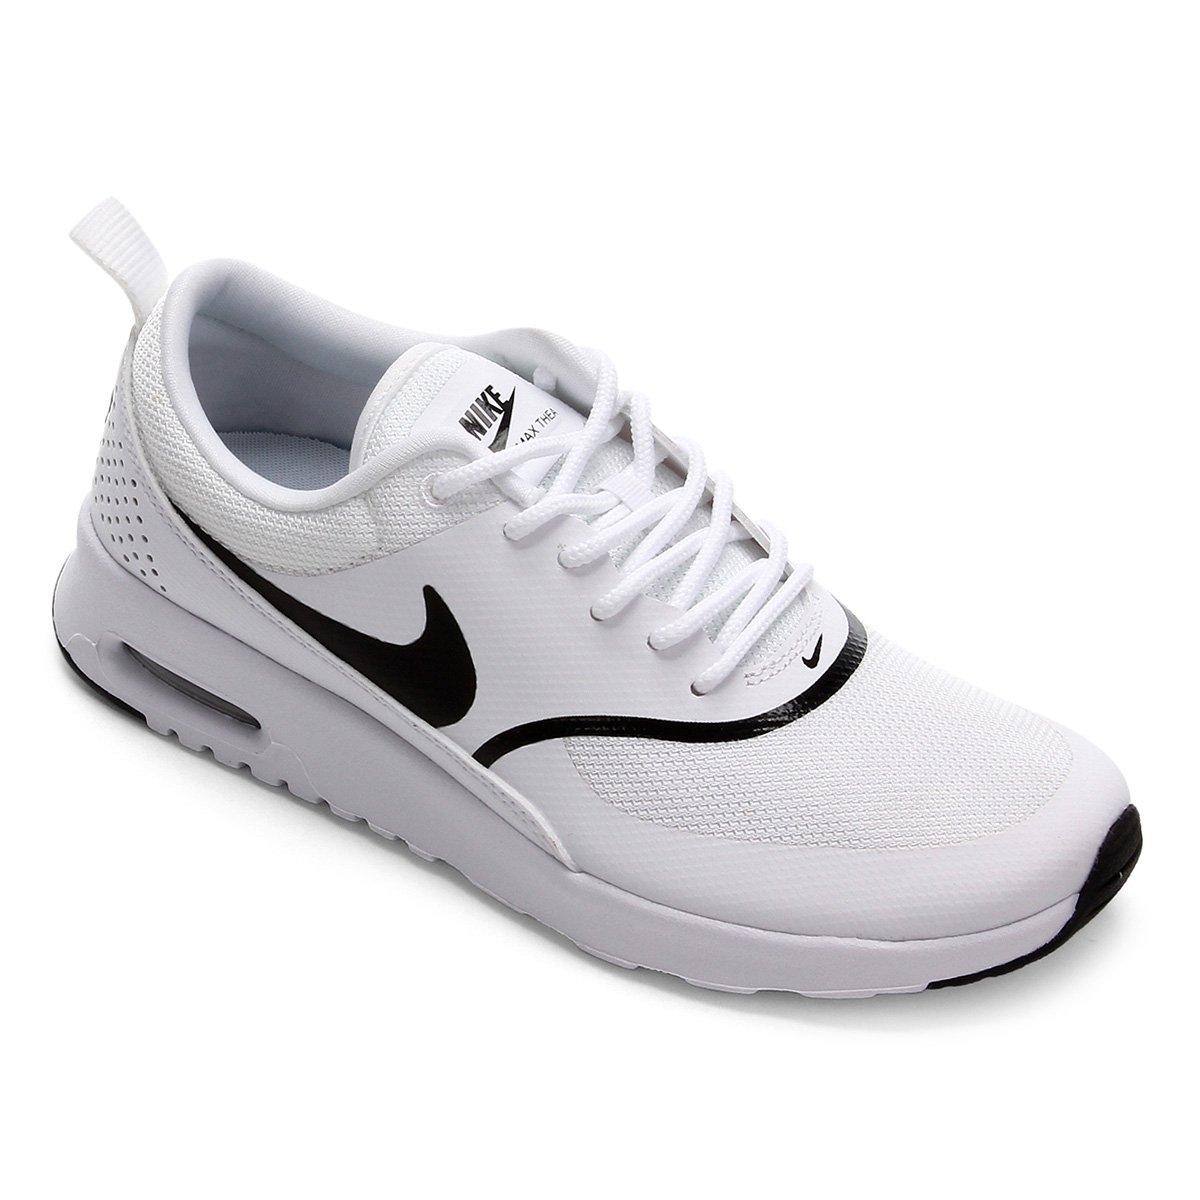 Tênis Nike Air Max Thea Feminino Branco E Preto